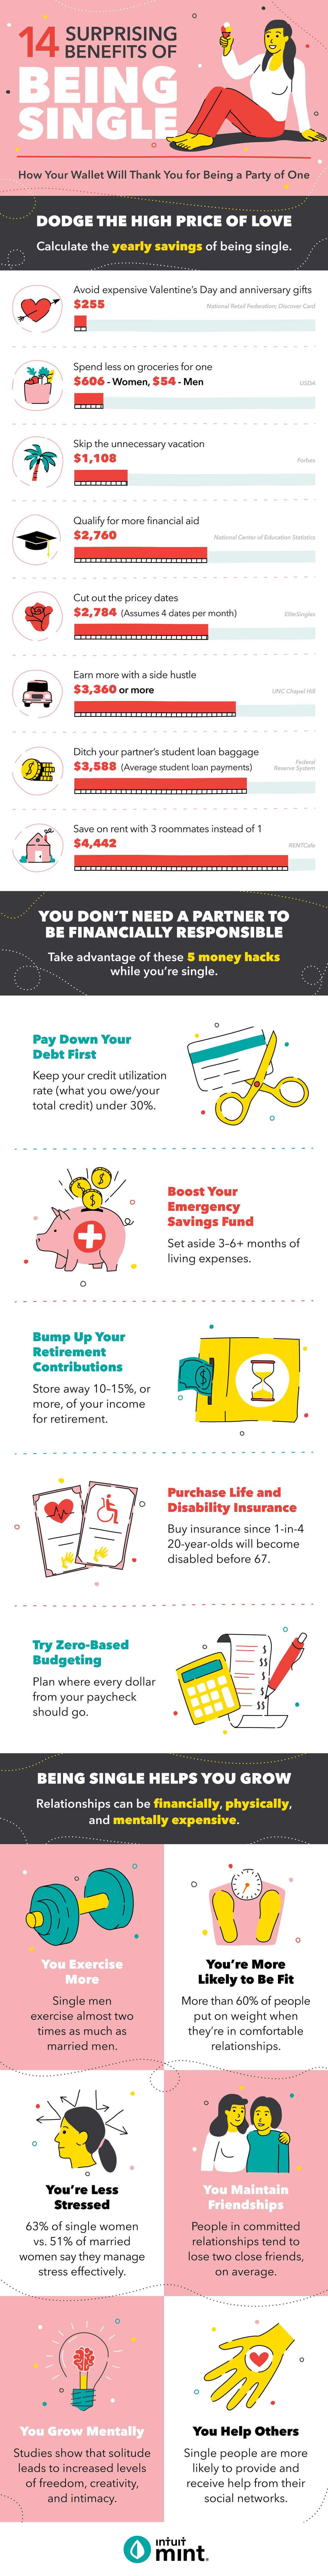 14-surprising-benefits-of-being-single